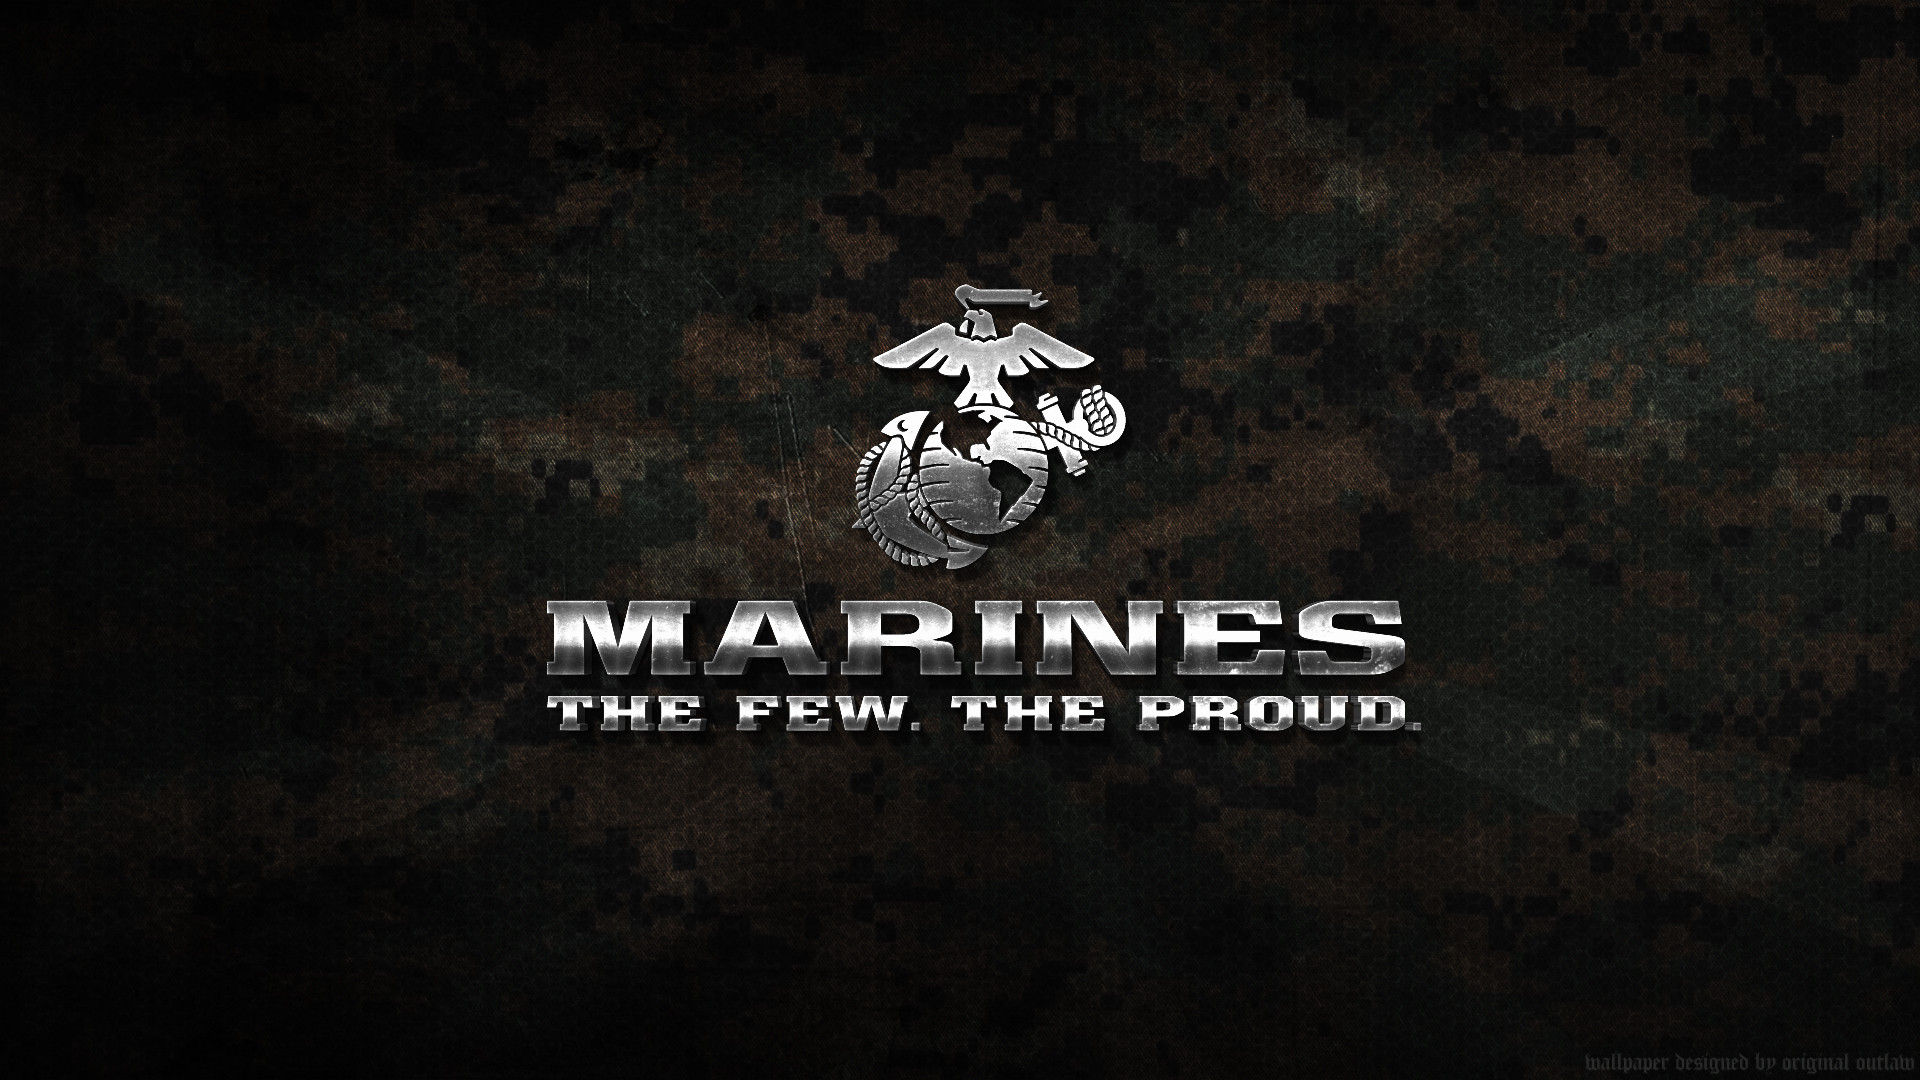 United States Marine Corps Wallpaper